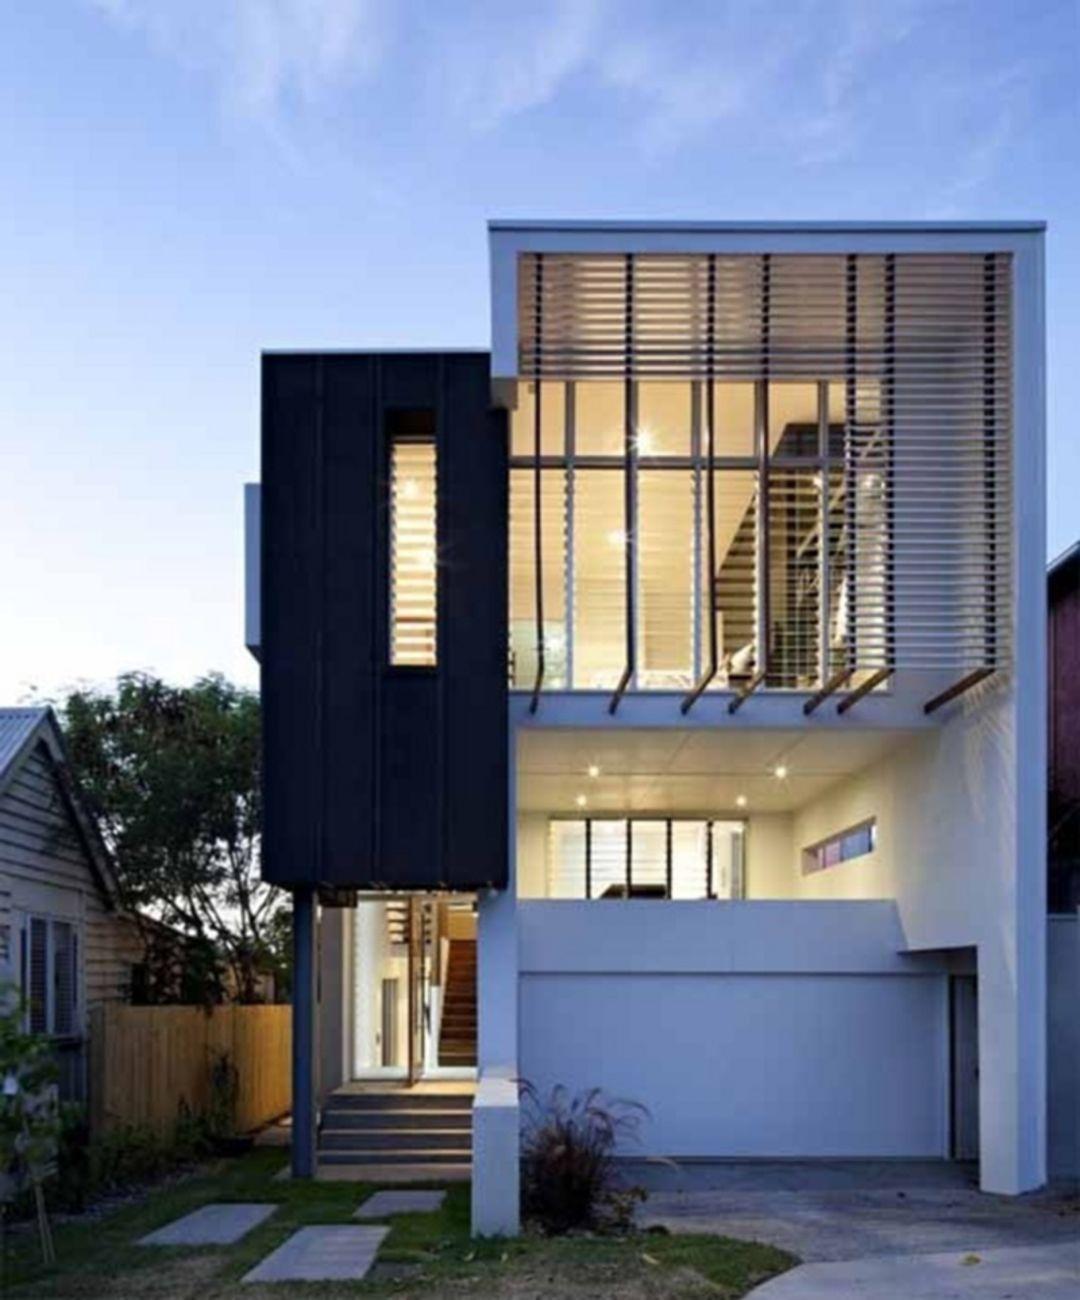 Best 20 Modern Small House Design For Inspiration Modern Small House Design Best Modern House Design Small House Design Architecture